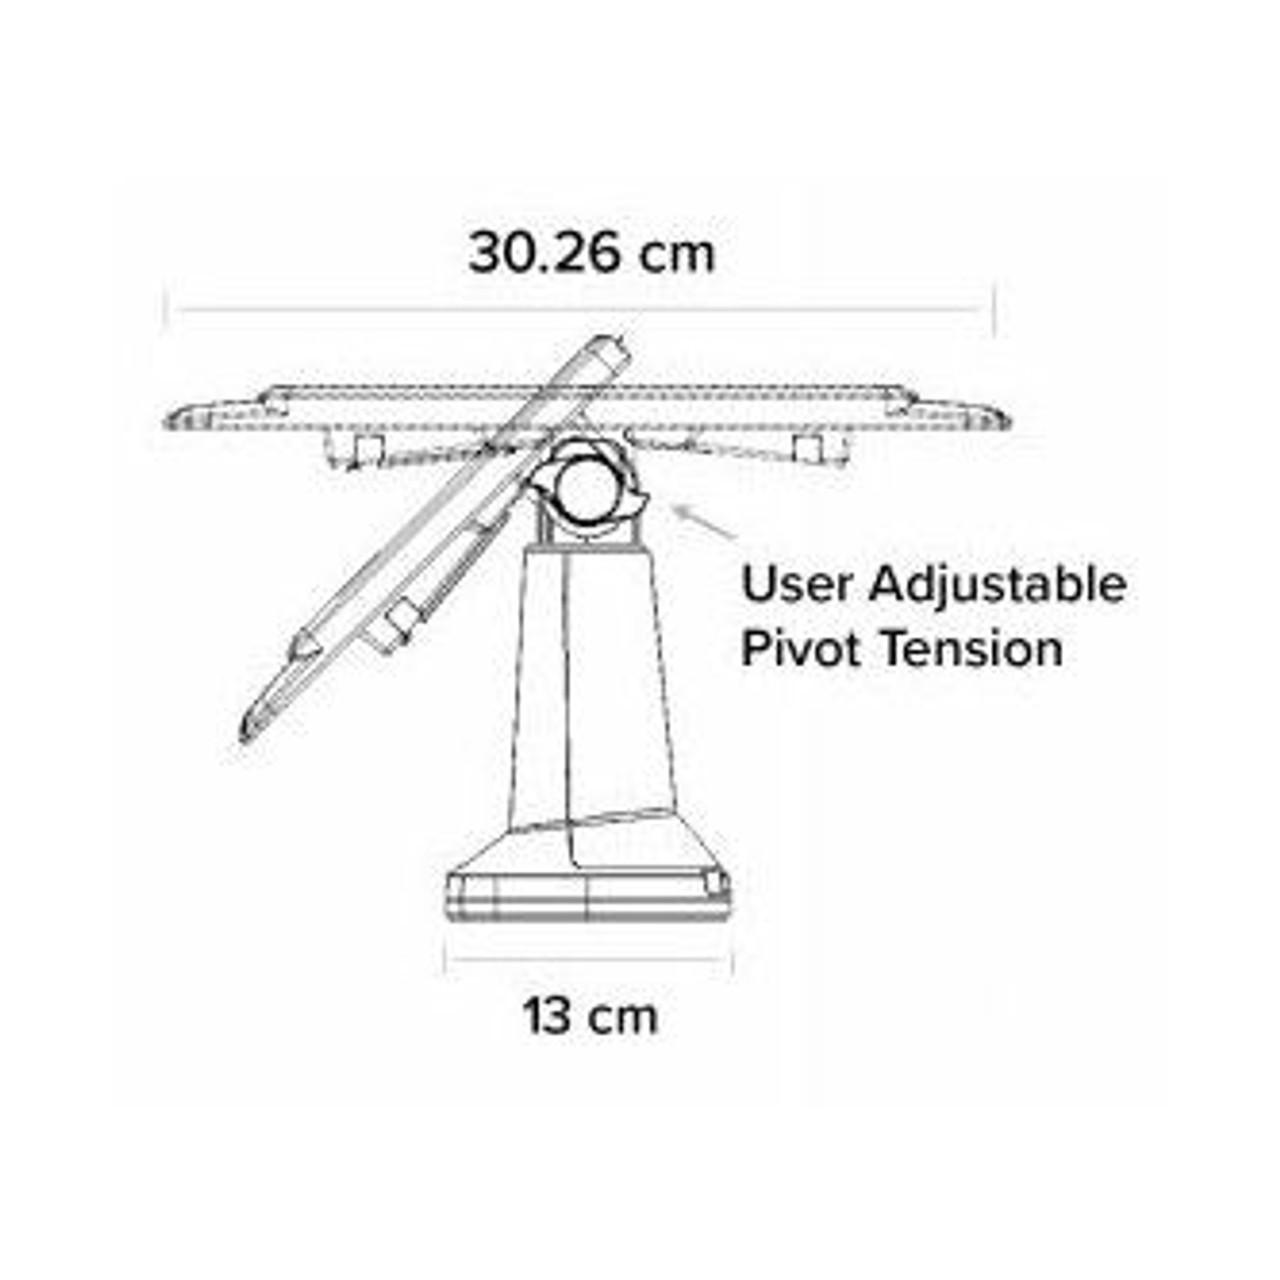 Ingenico iWL 220 250 252 281 Tailwind FlexiPole Plus Stand